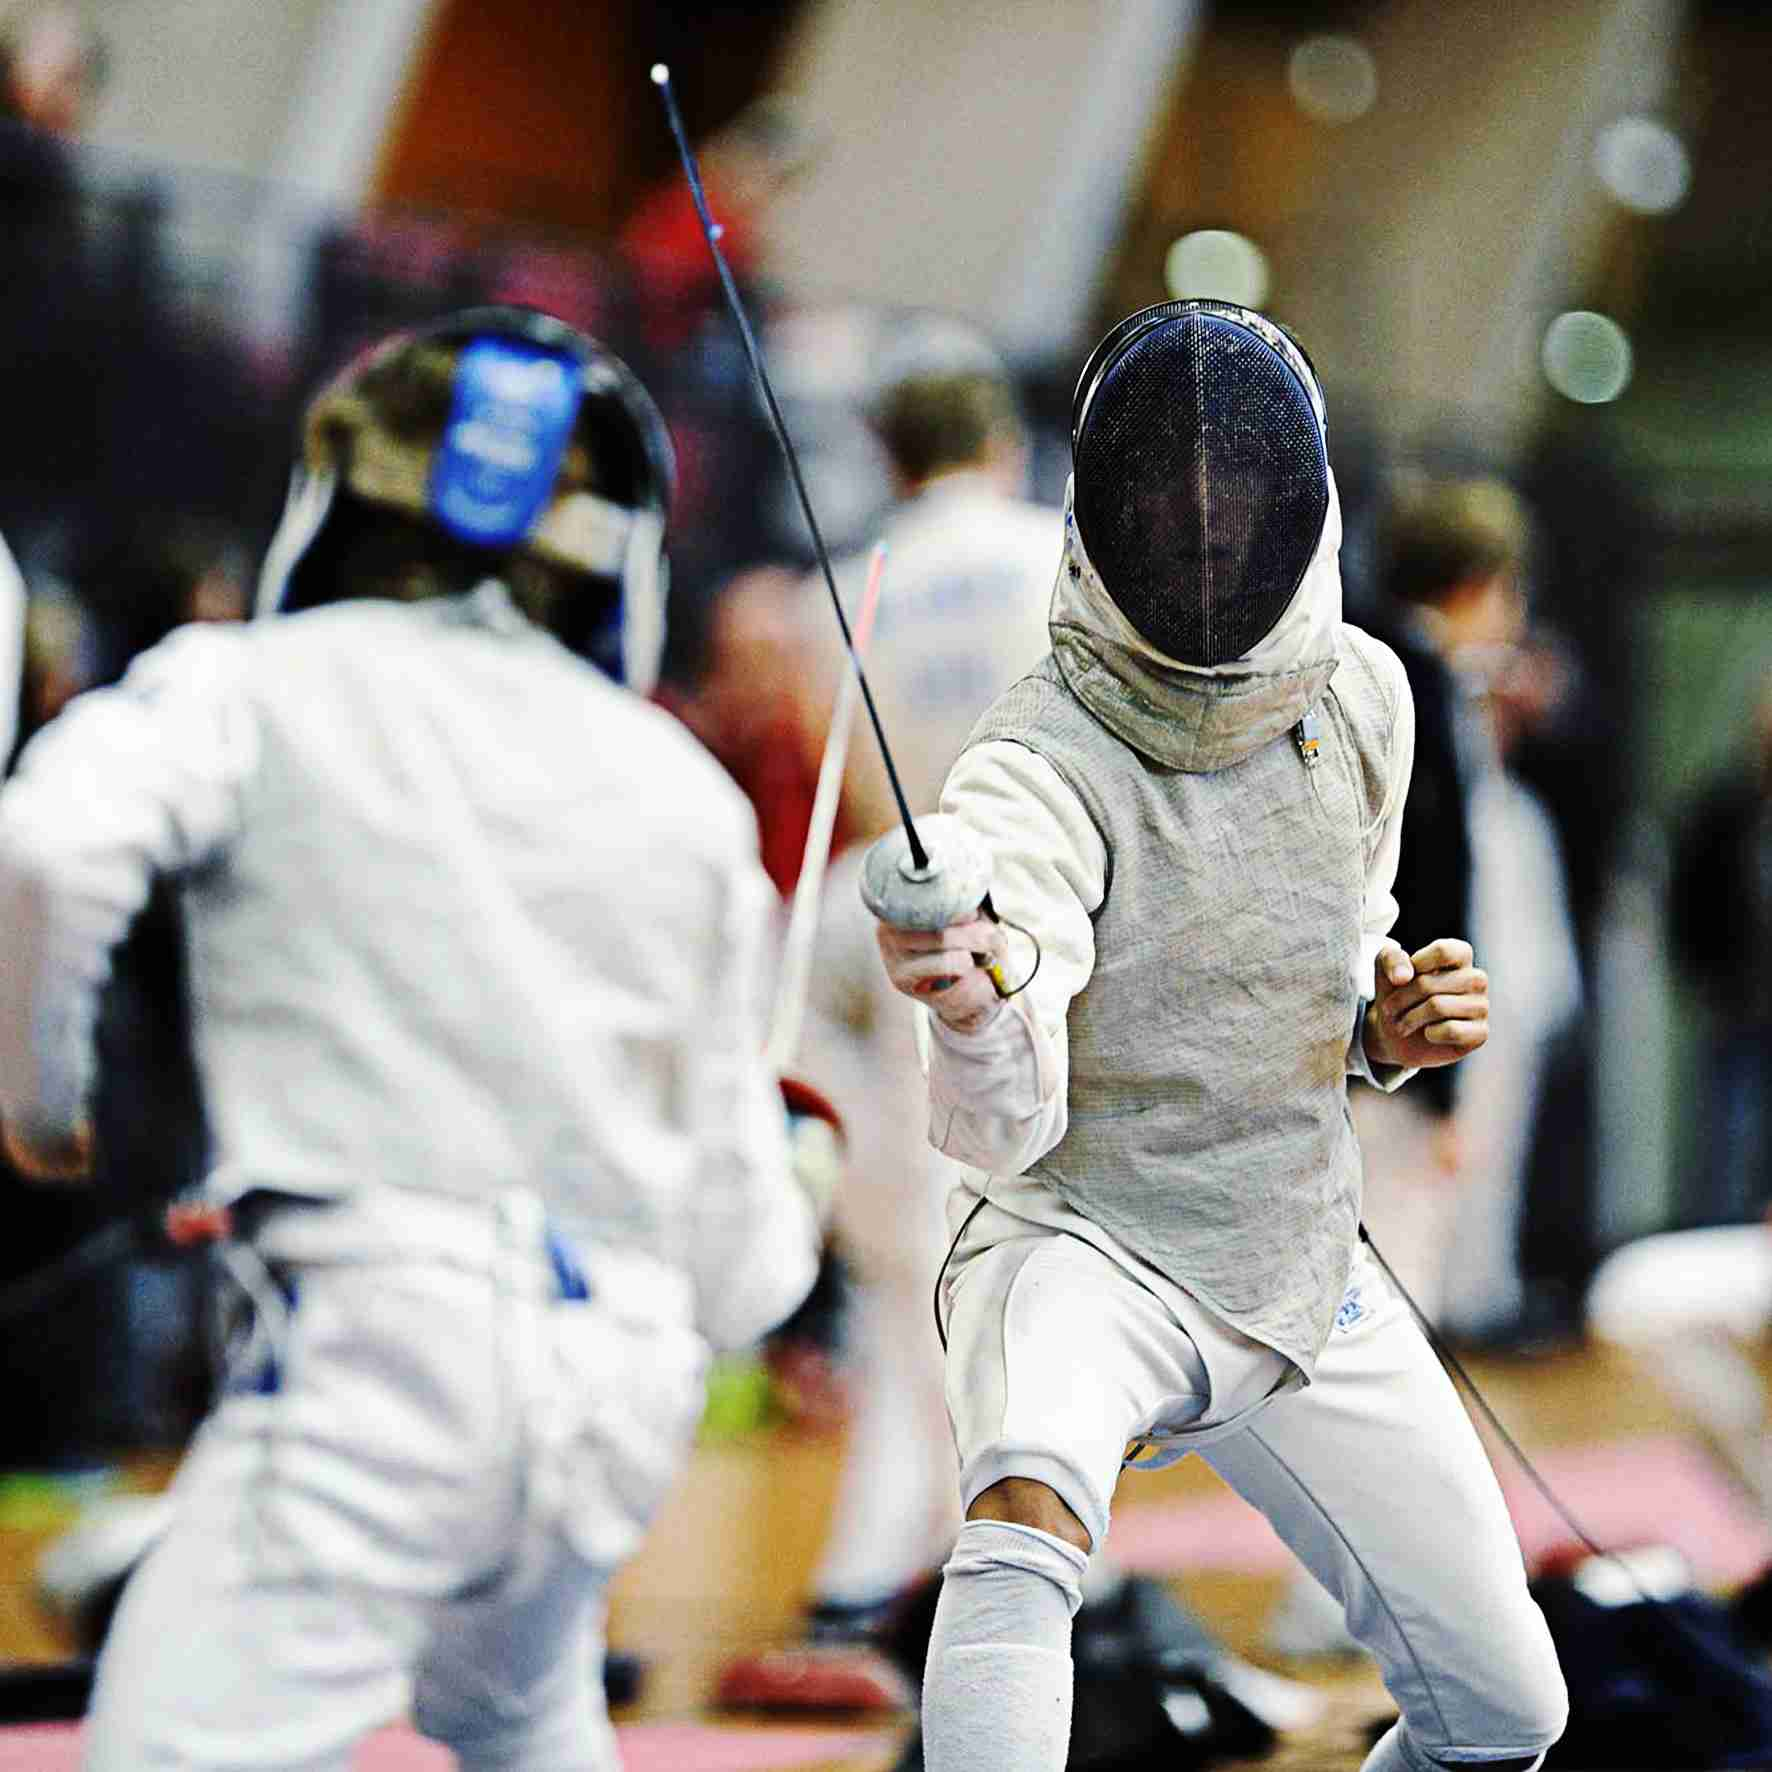 Sporthalle Am 2 Ring Wiesbaden